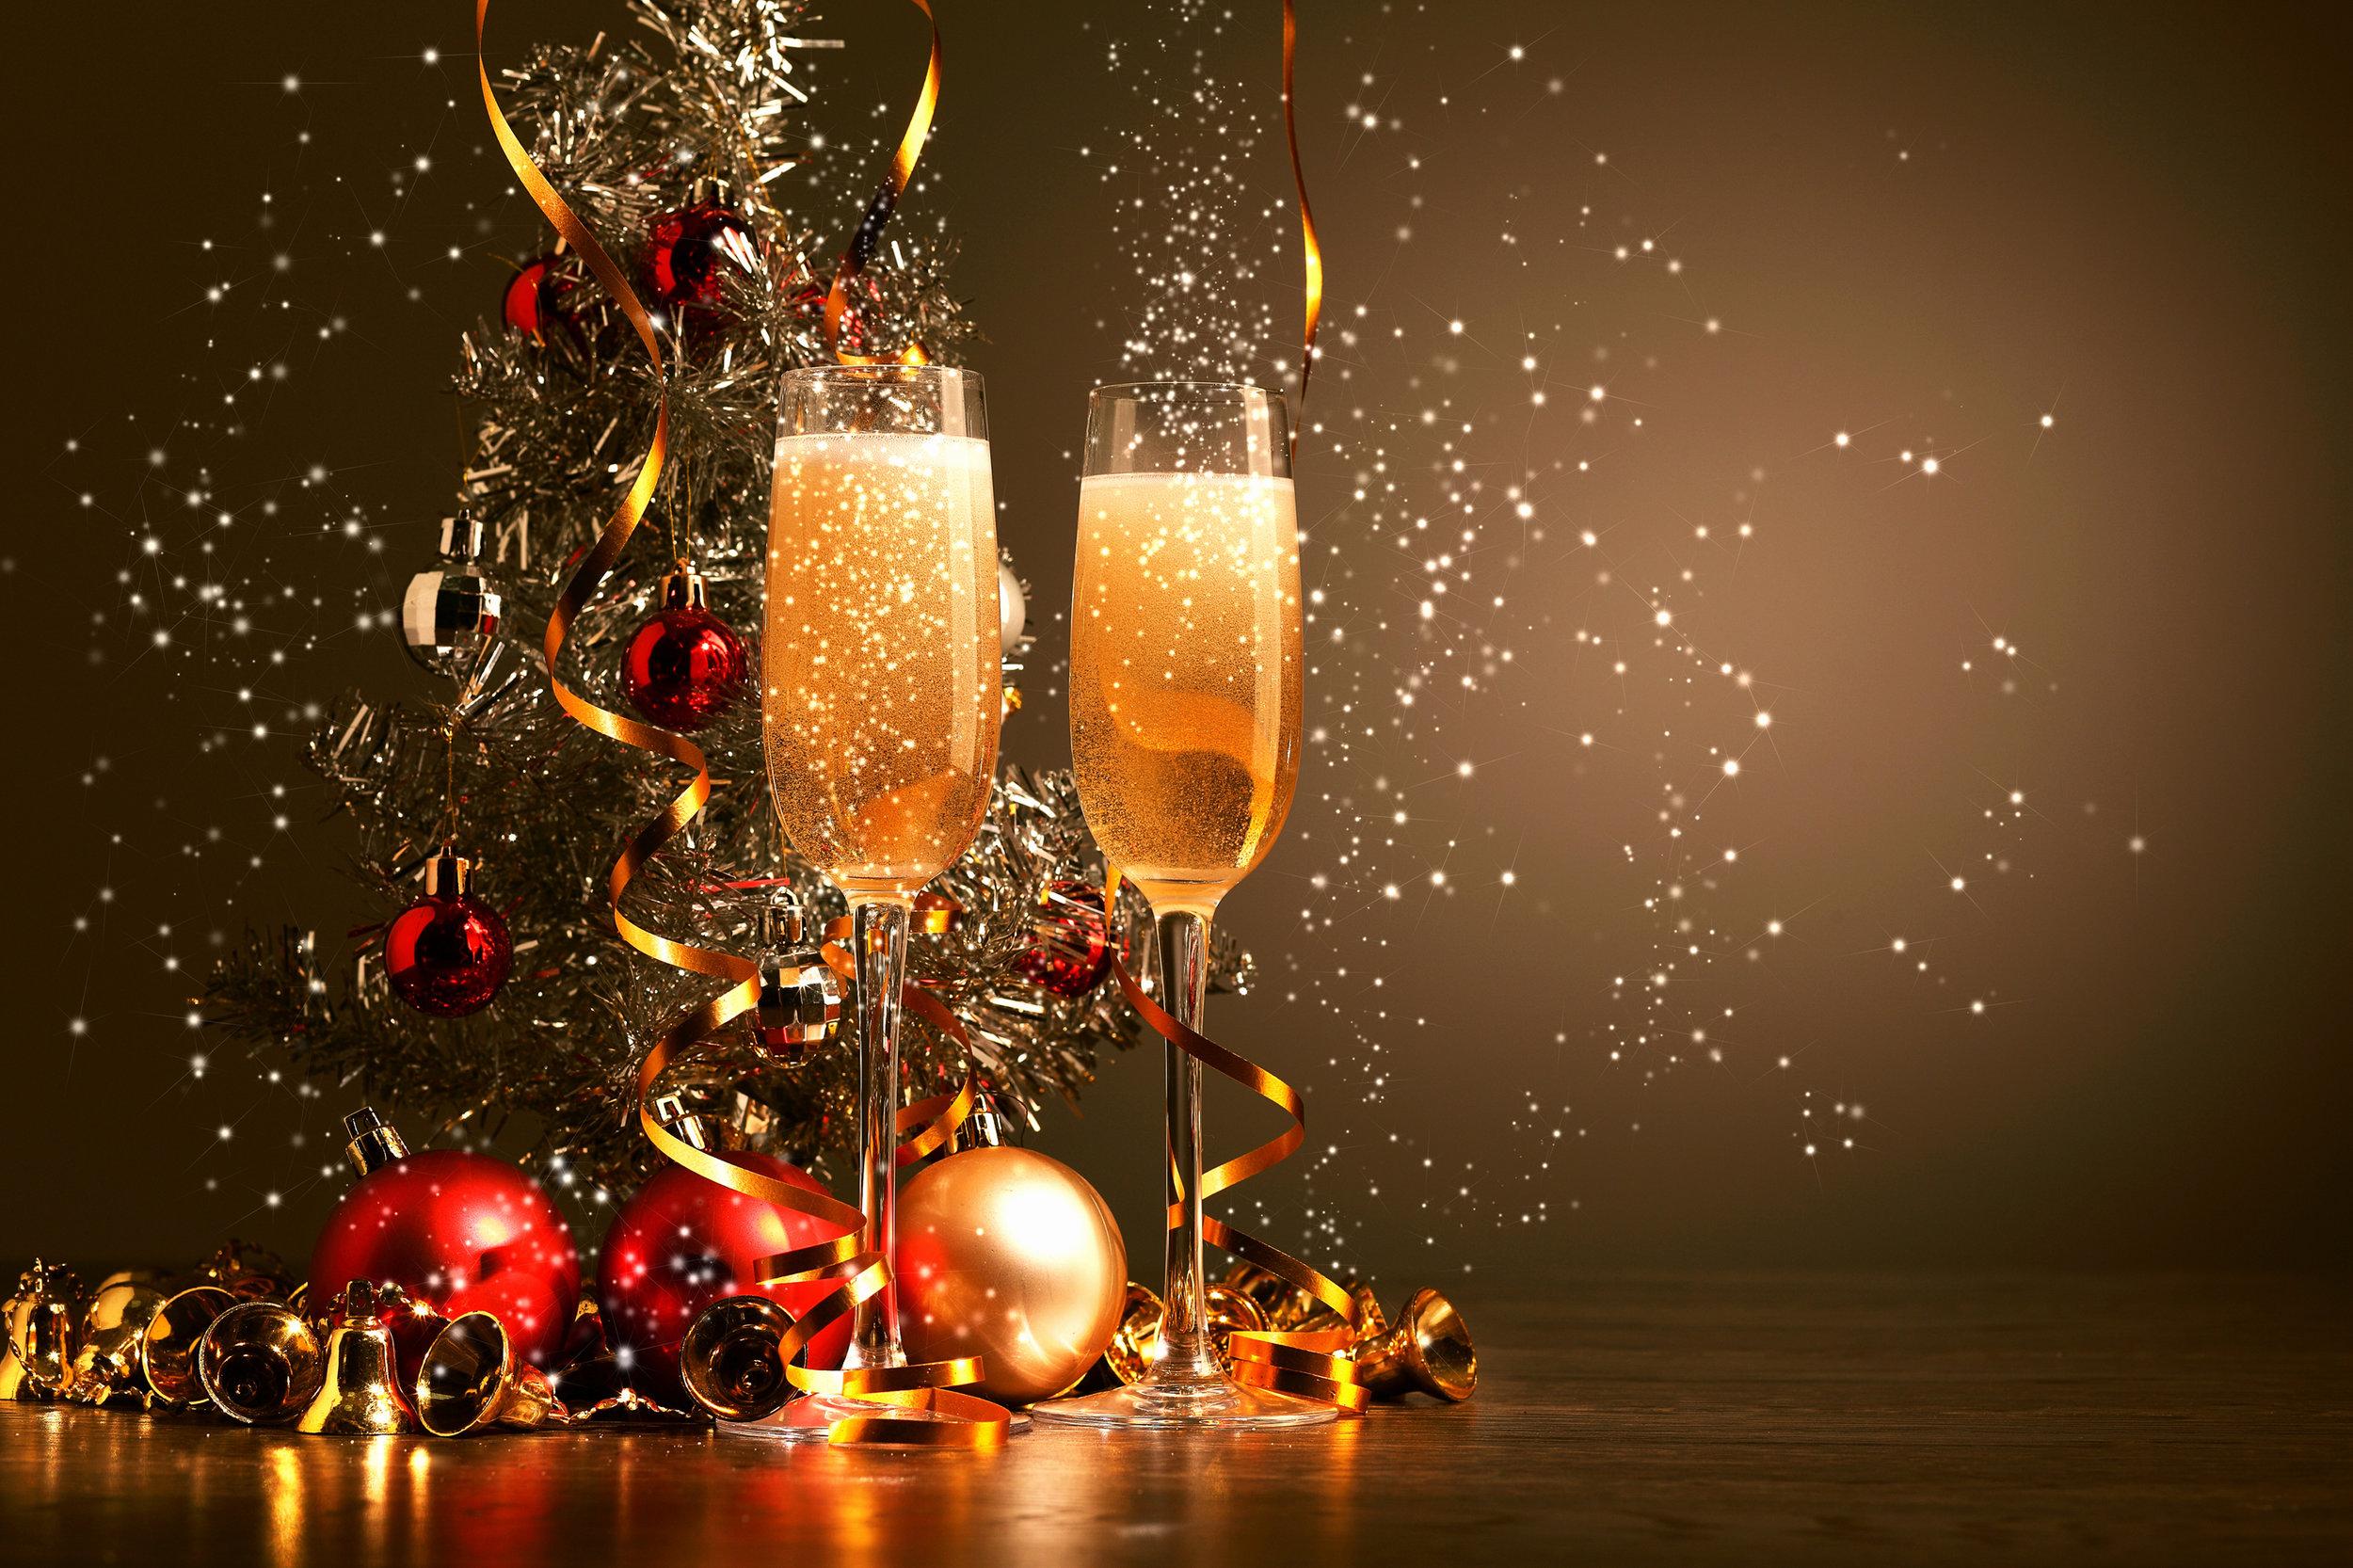 benchmark-wine-bar-canberra-new-years-eve-2017-2011.jpg